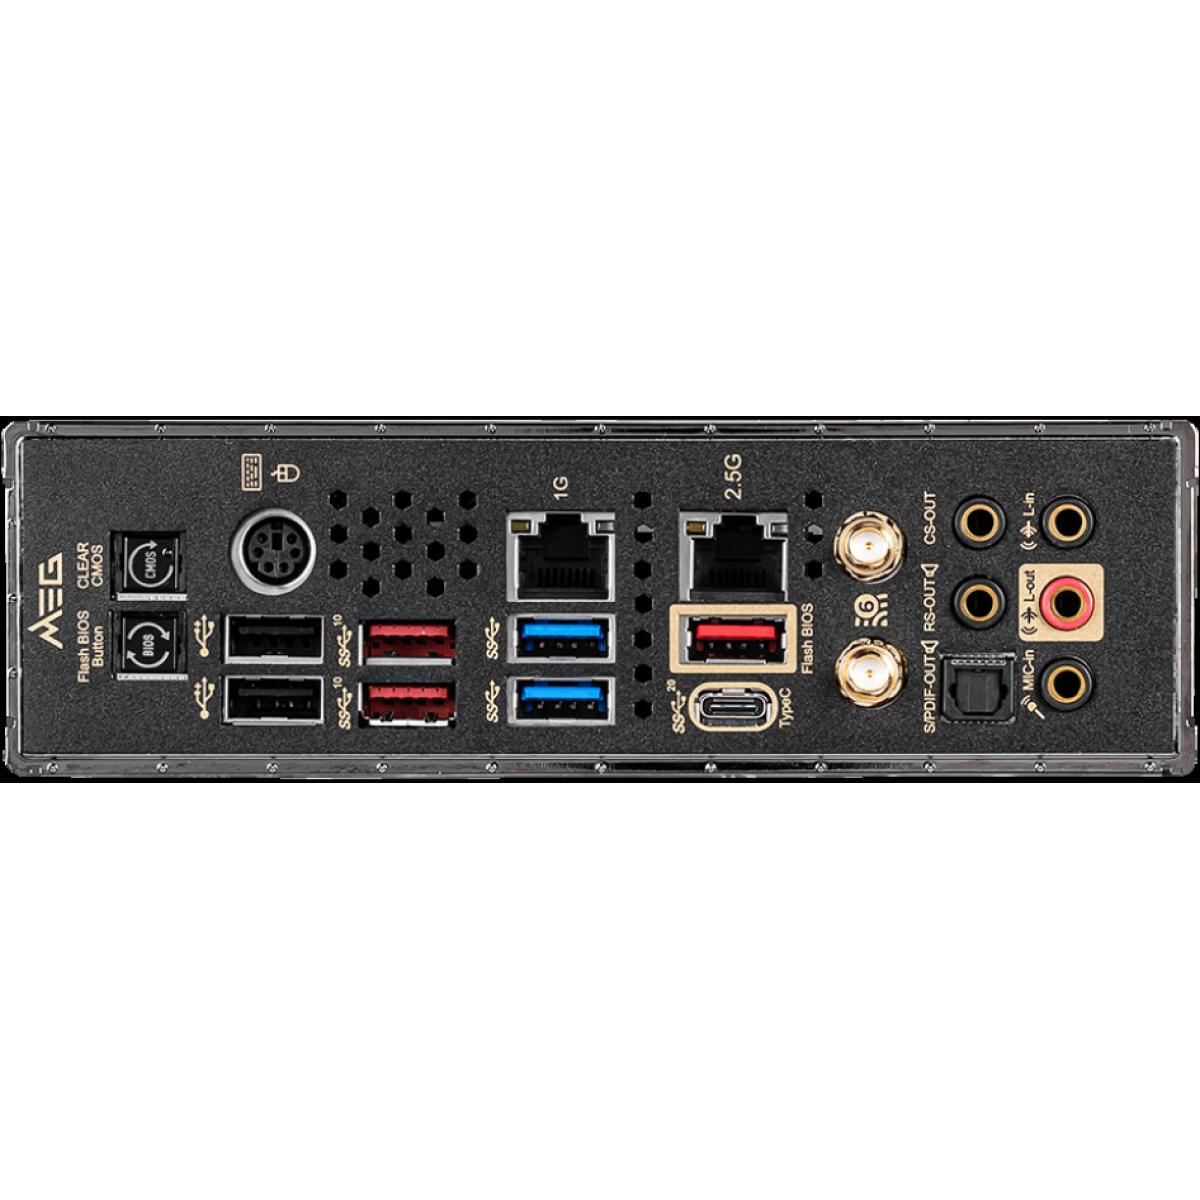 Placa Mãe MSI Meg Z490 Ace, Chipset Z490, Intel LGA 1200, ATX, DDR4